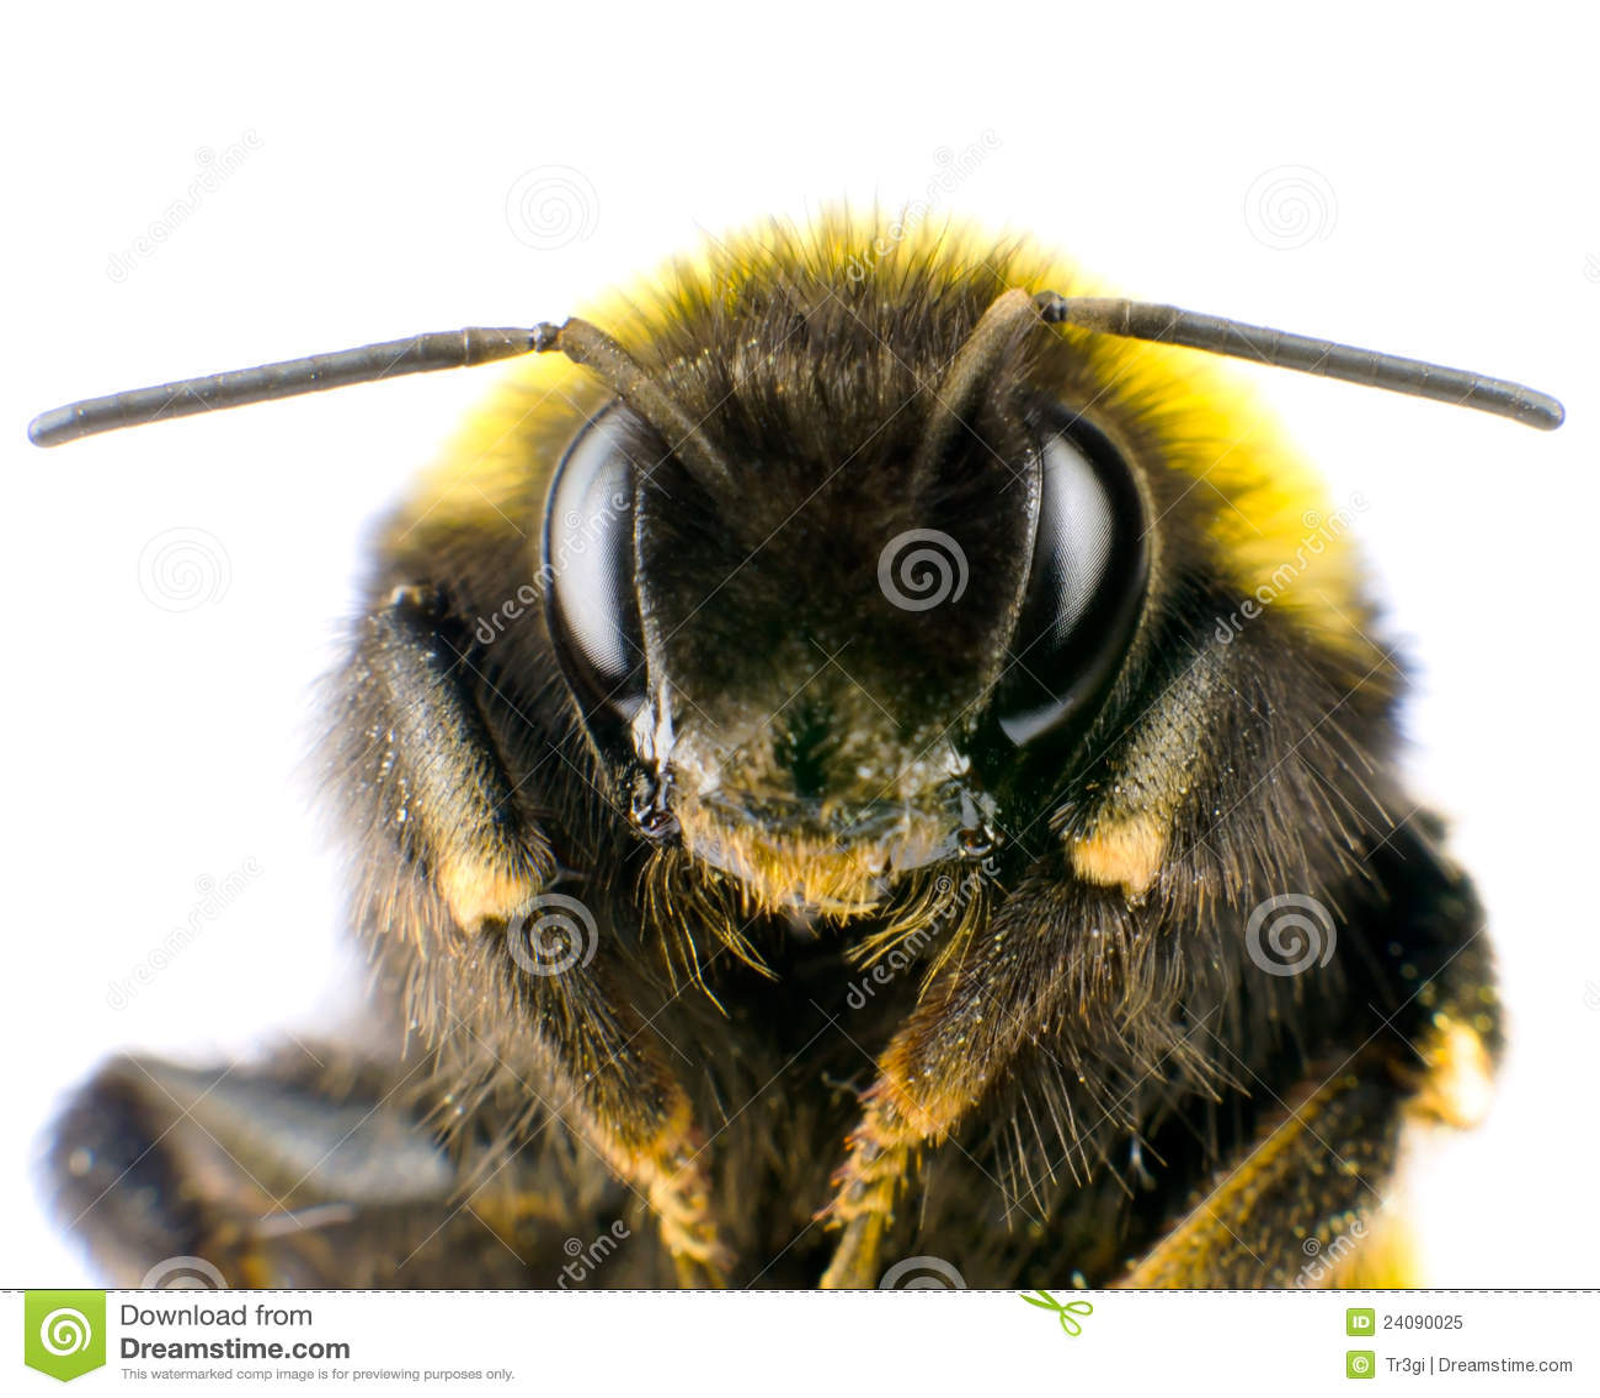 Ultra Macro Of Bumblebee Head With Antennas Stock Image ...